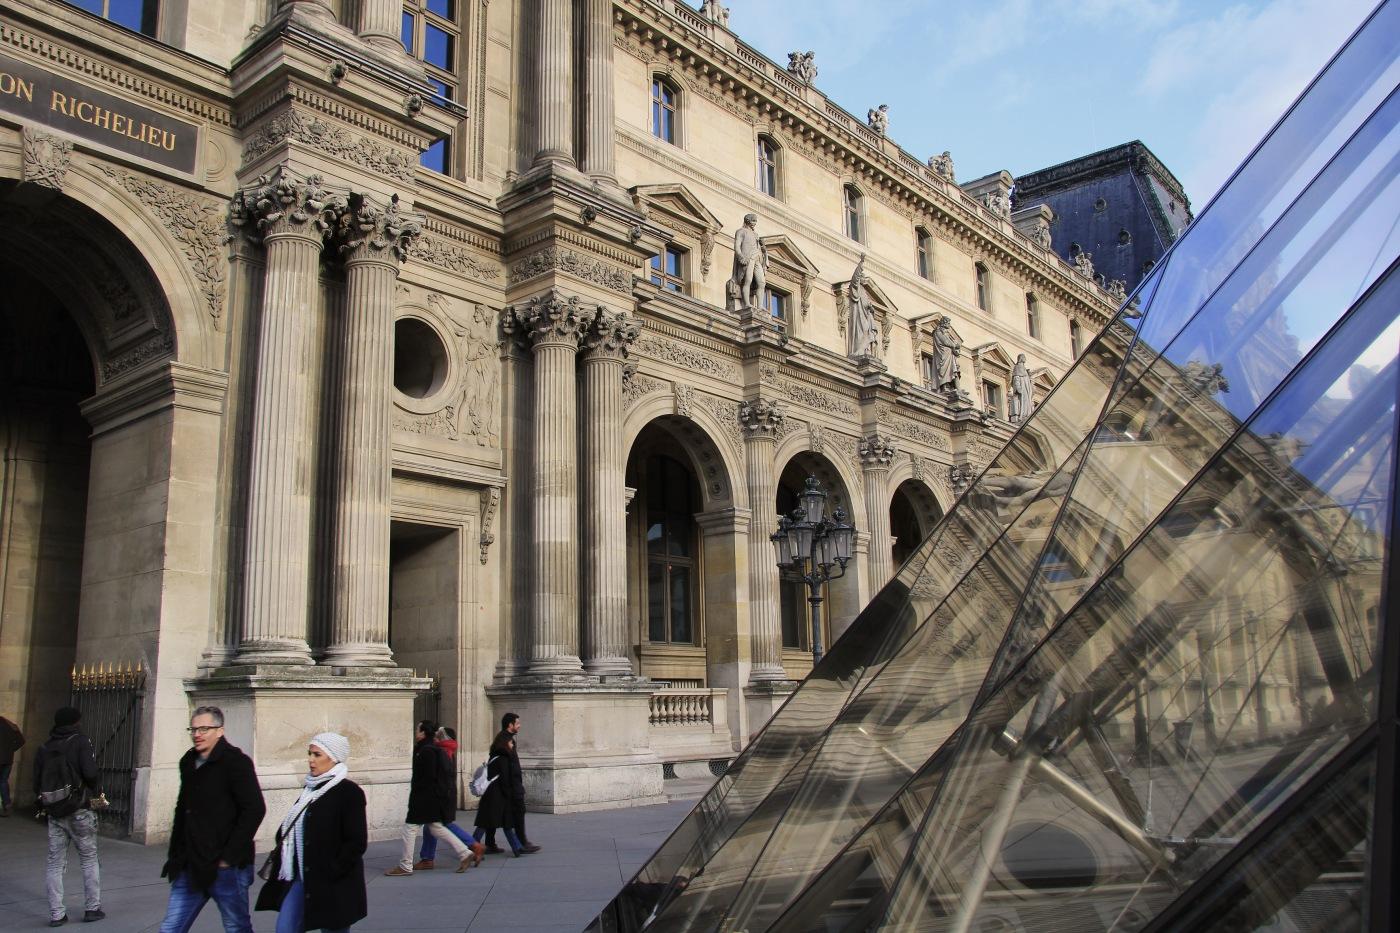 The Louvre edit